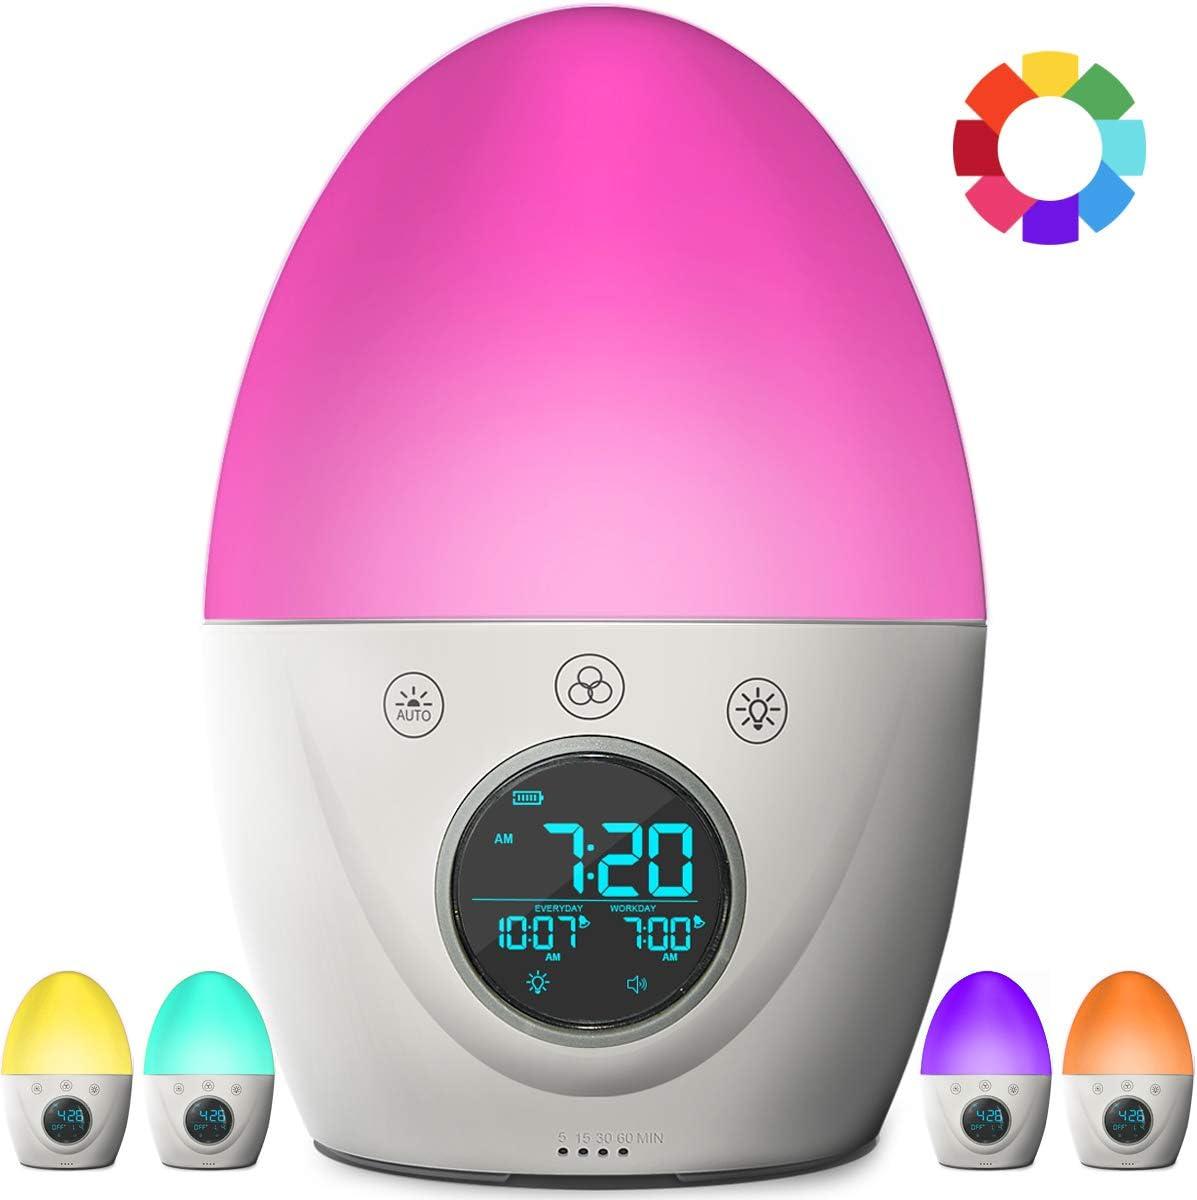 FiveHome Kids Alarm Clock, Children's Sleep Trainer, 7 Color Wake Up Light & Night Light, Sleep Timer -Teaches Child When Fine to Wake Up (V 2.0)